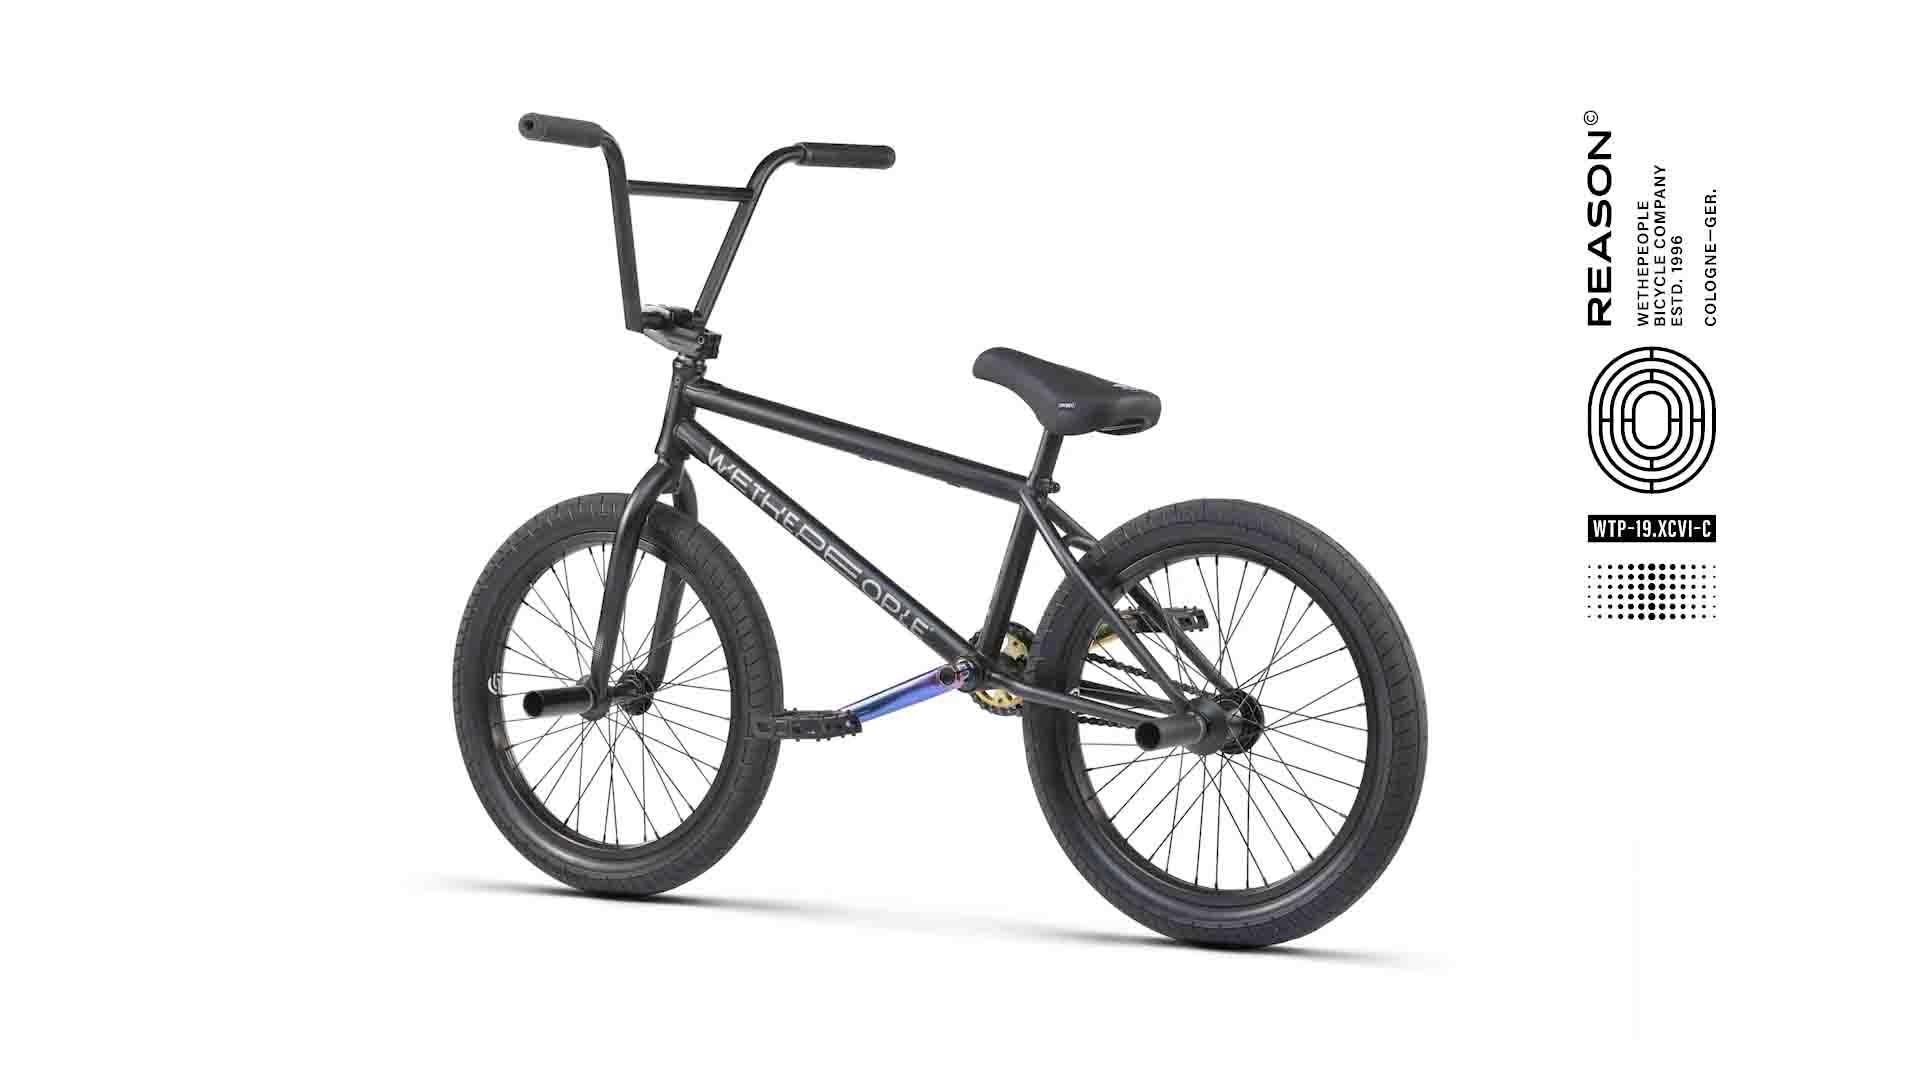 The REASON 2021 Complete Bike - WETHEPEOPLE BMX